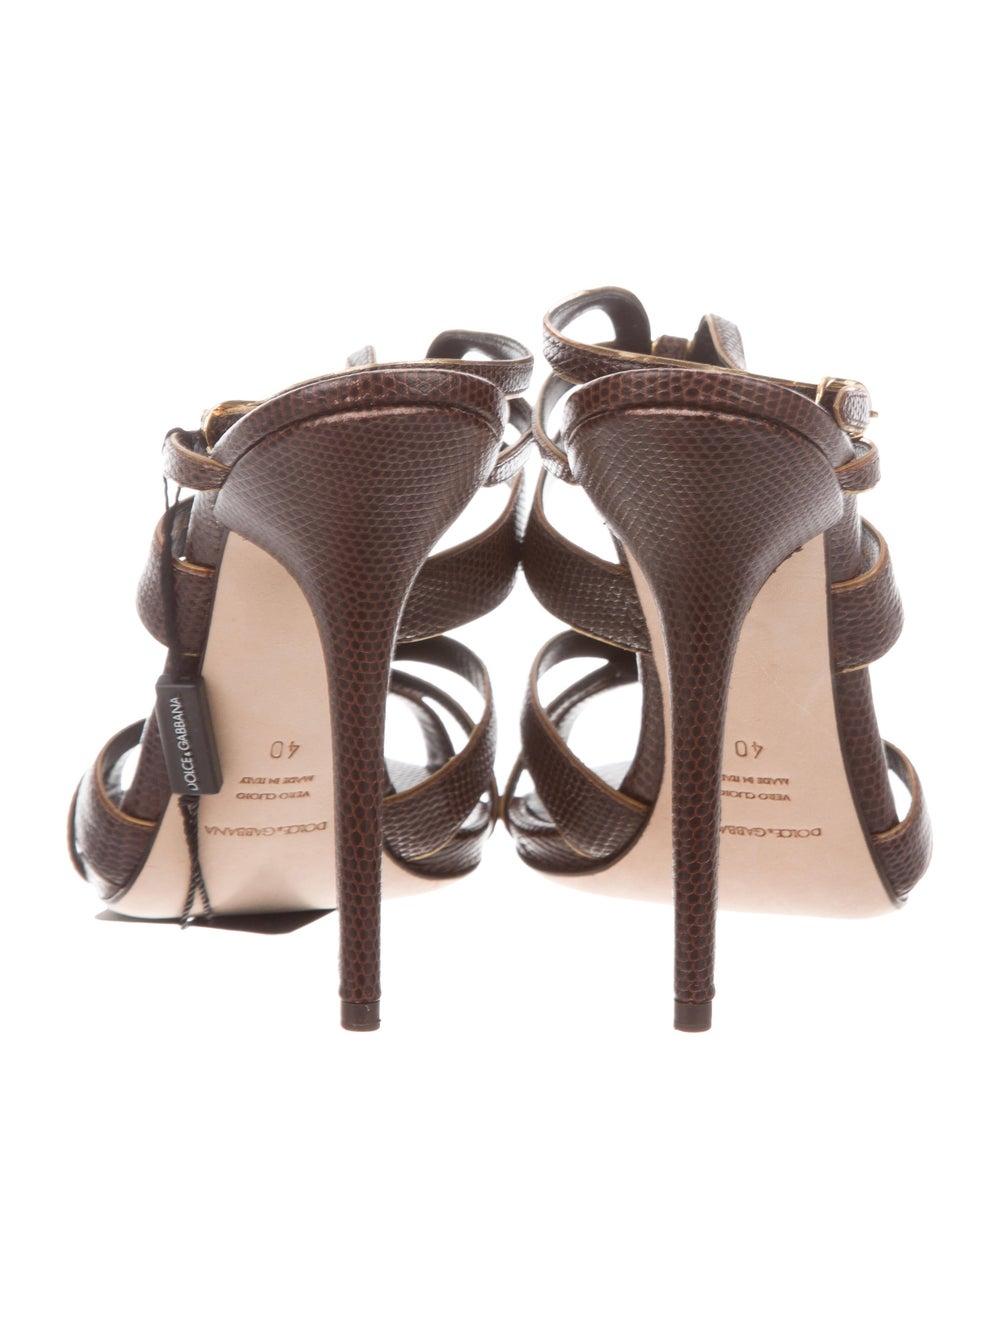 Dolce & Gabbana Lizard Strappy Sandals - image 4